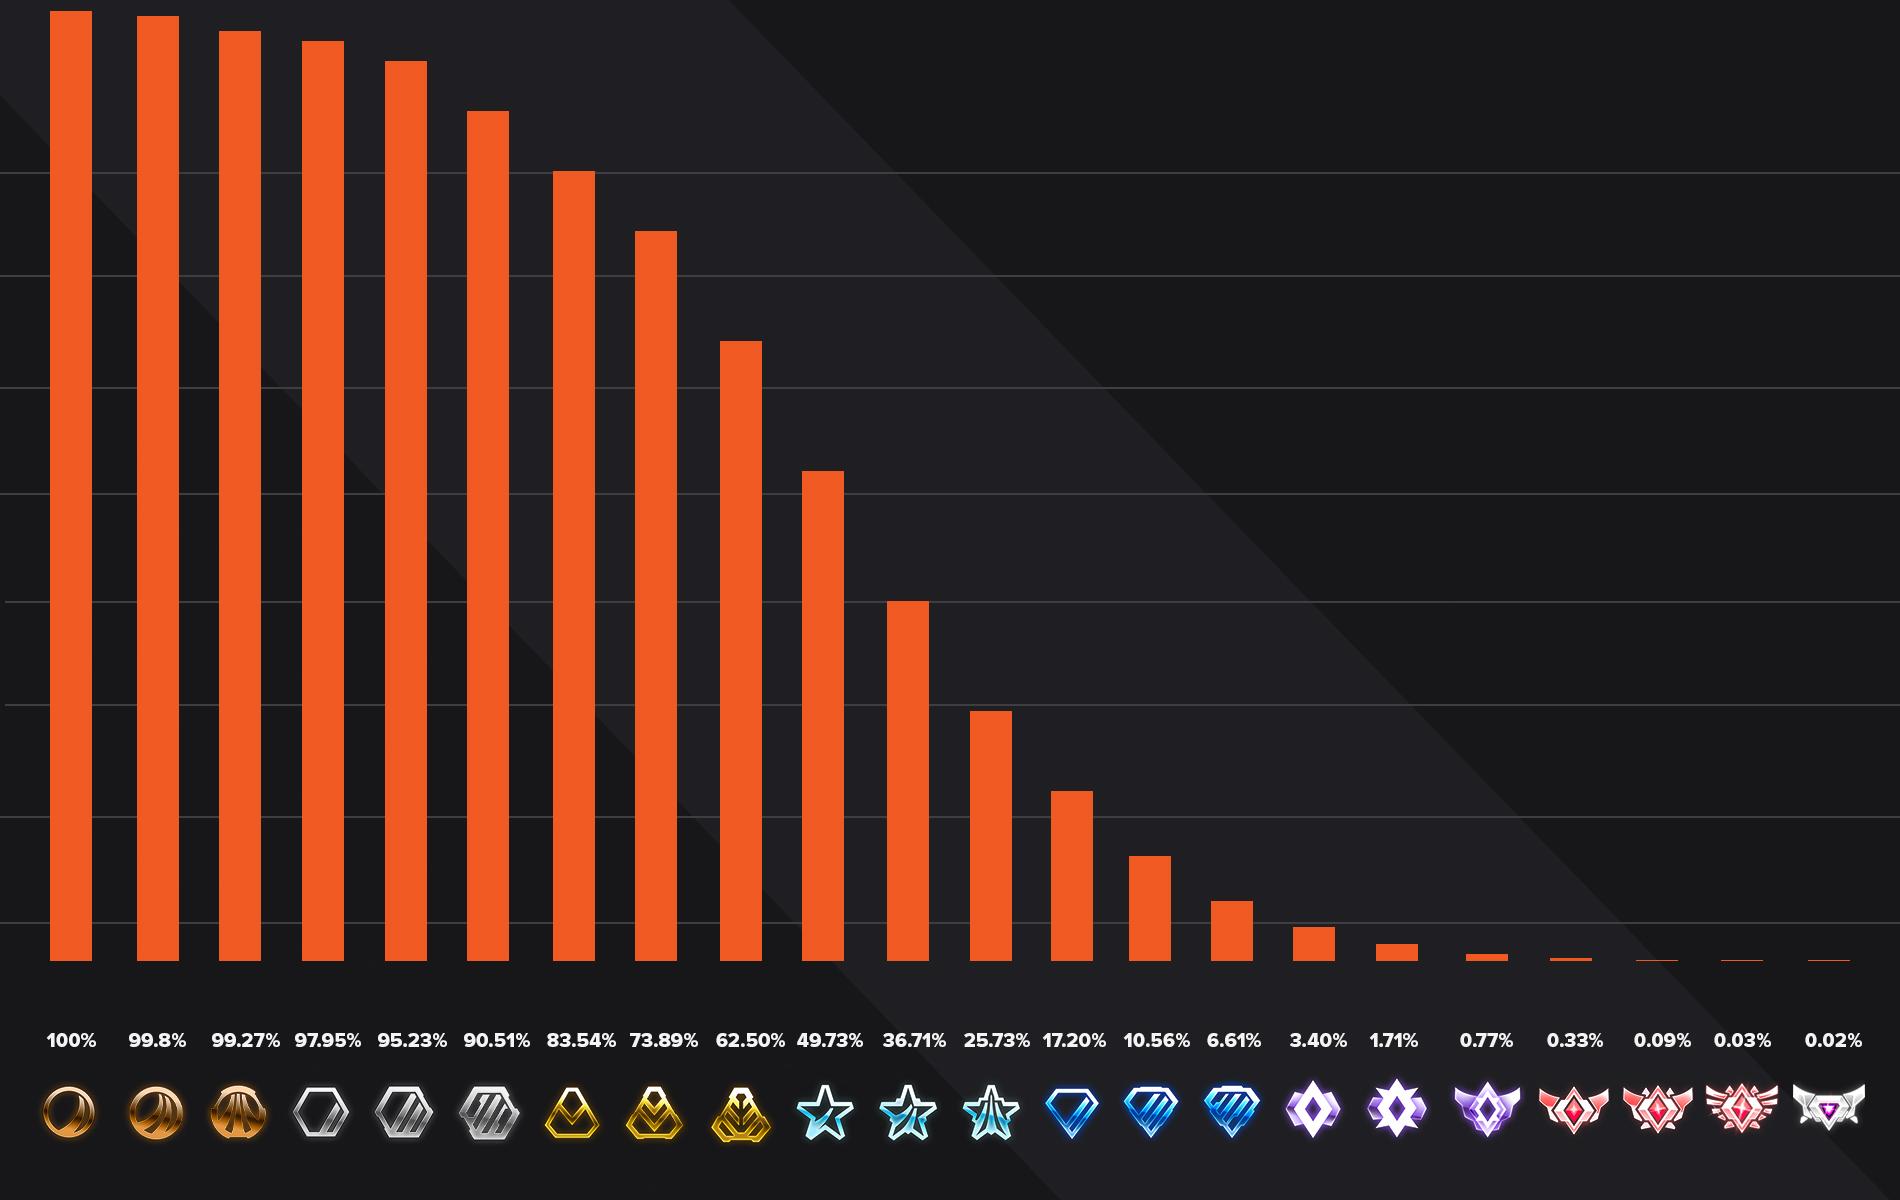 rocket league ranks distribution